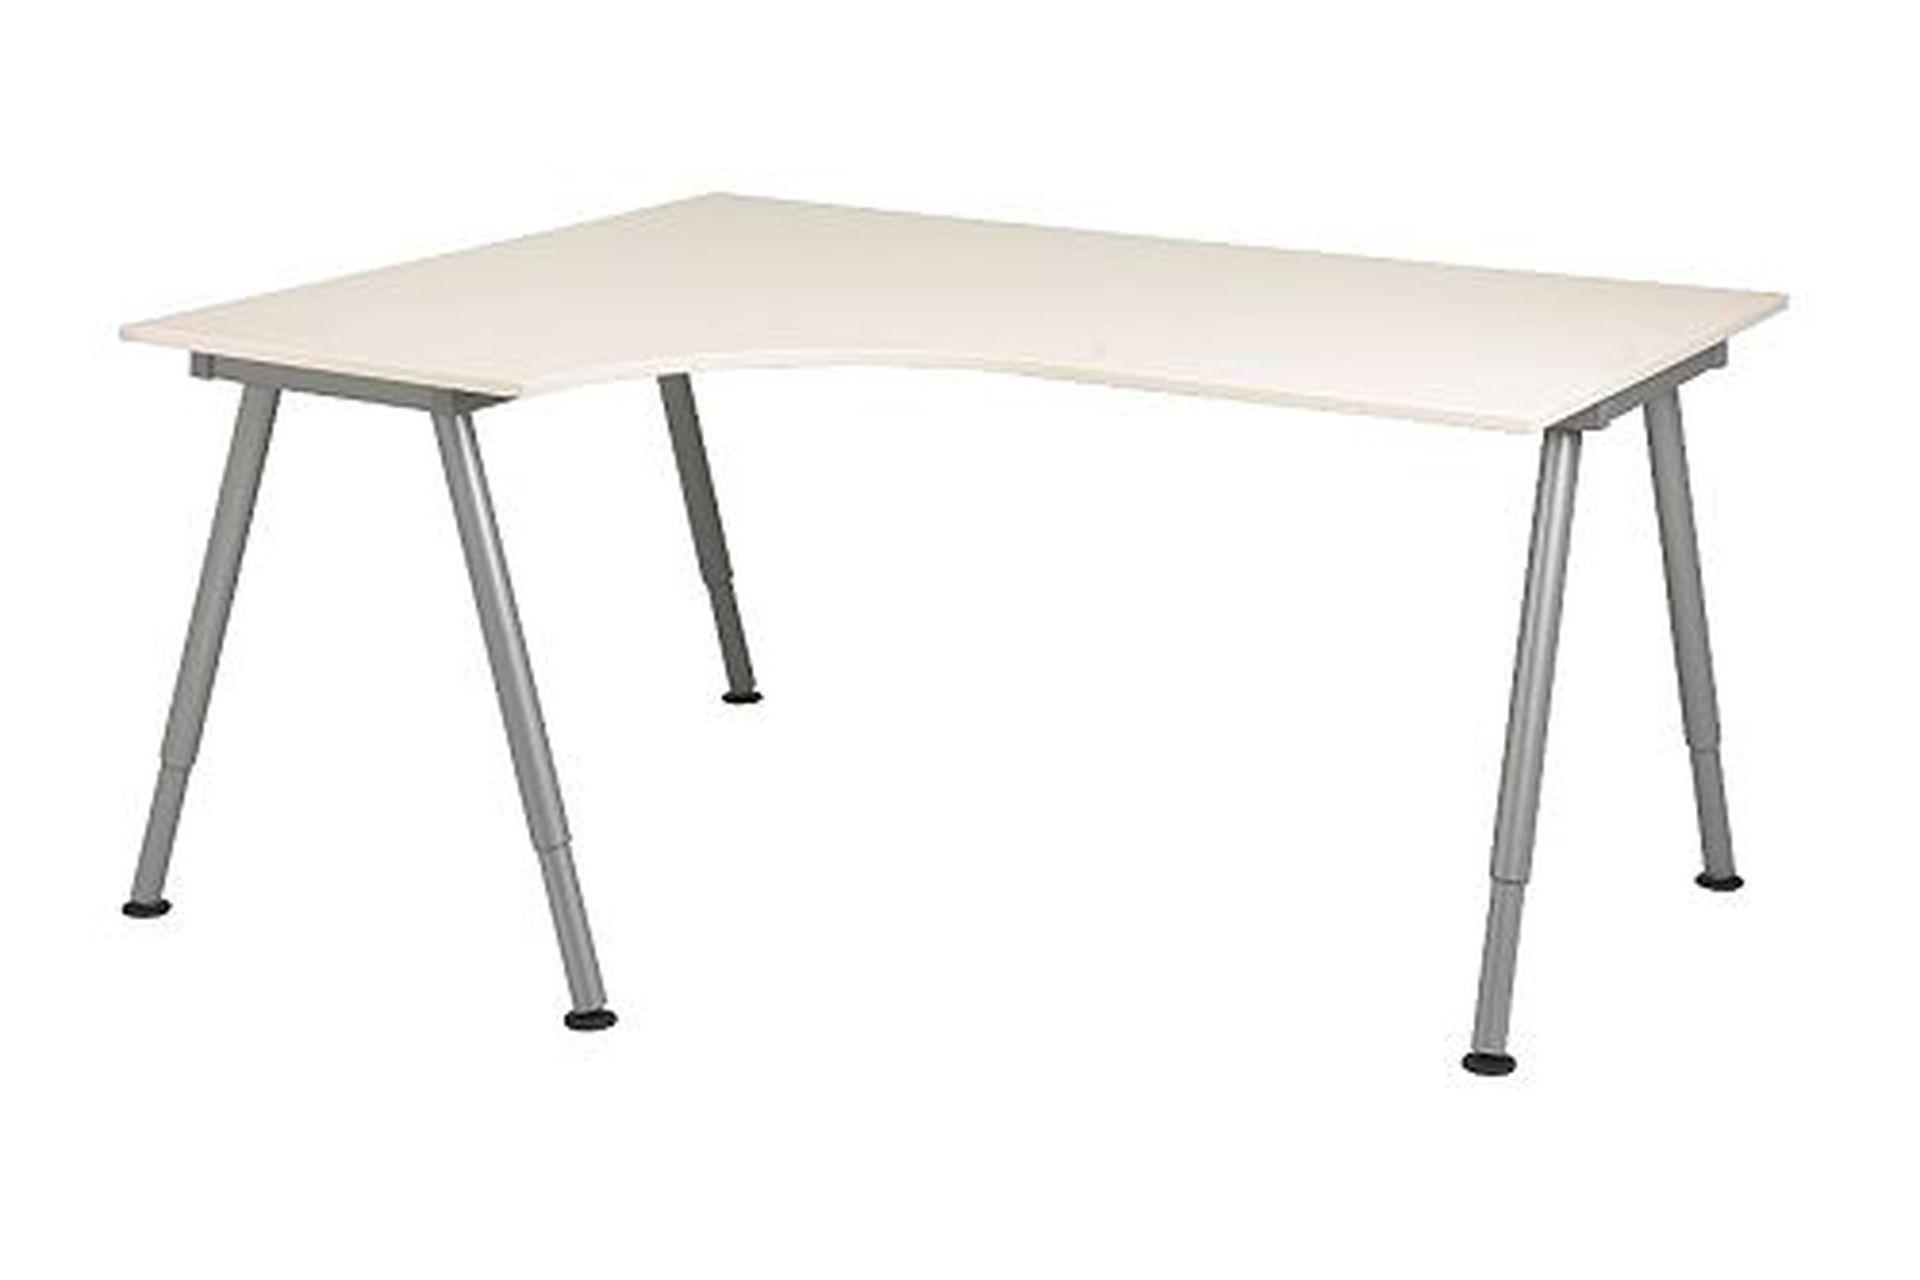 corner desks white foter rh foter com ikea corner desk with doors ikea corner desk with drawers